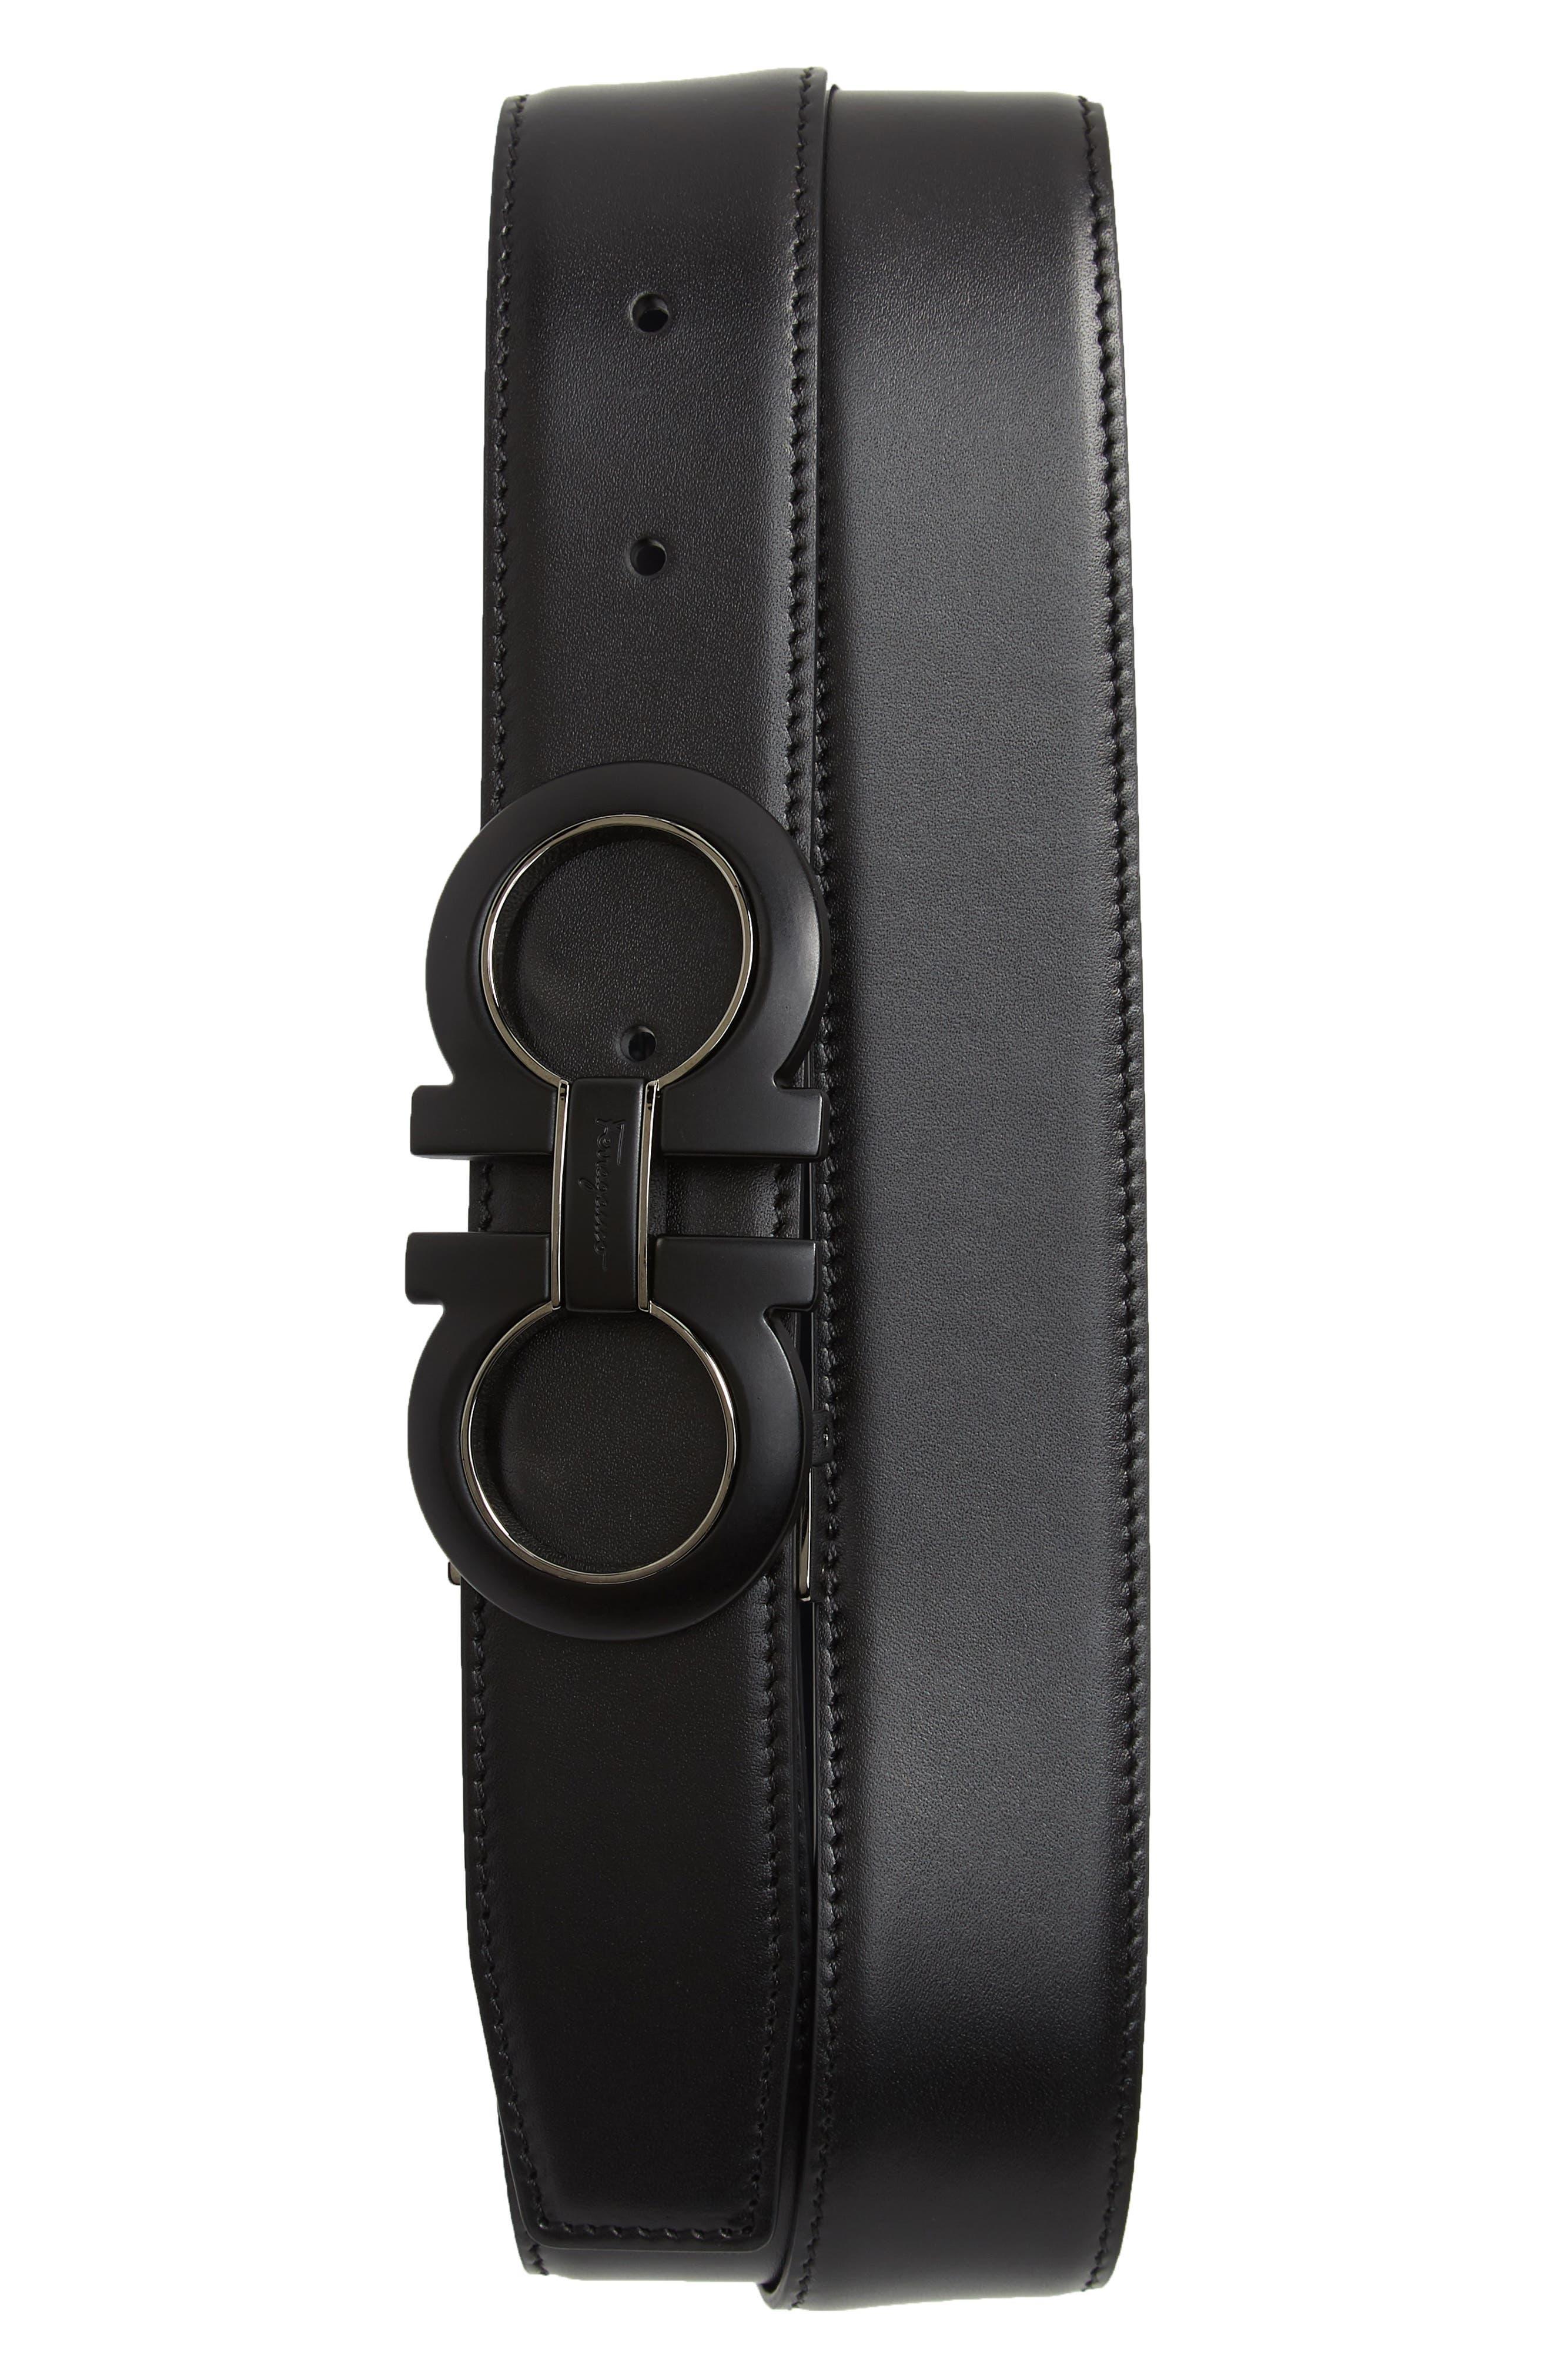 Reversible Leather Belt,                             Main thumbnail 1, color,                             NERO / BLUE MARINE